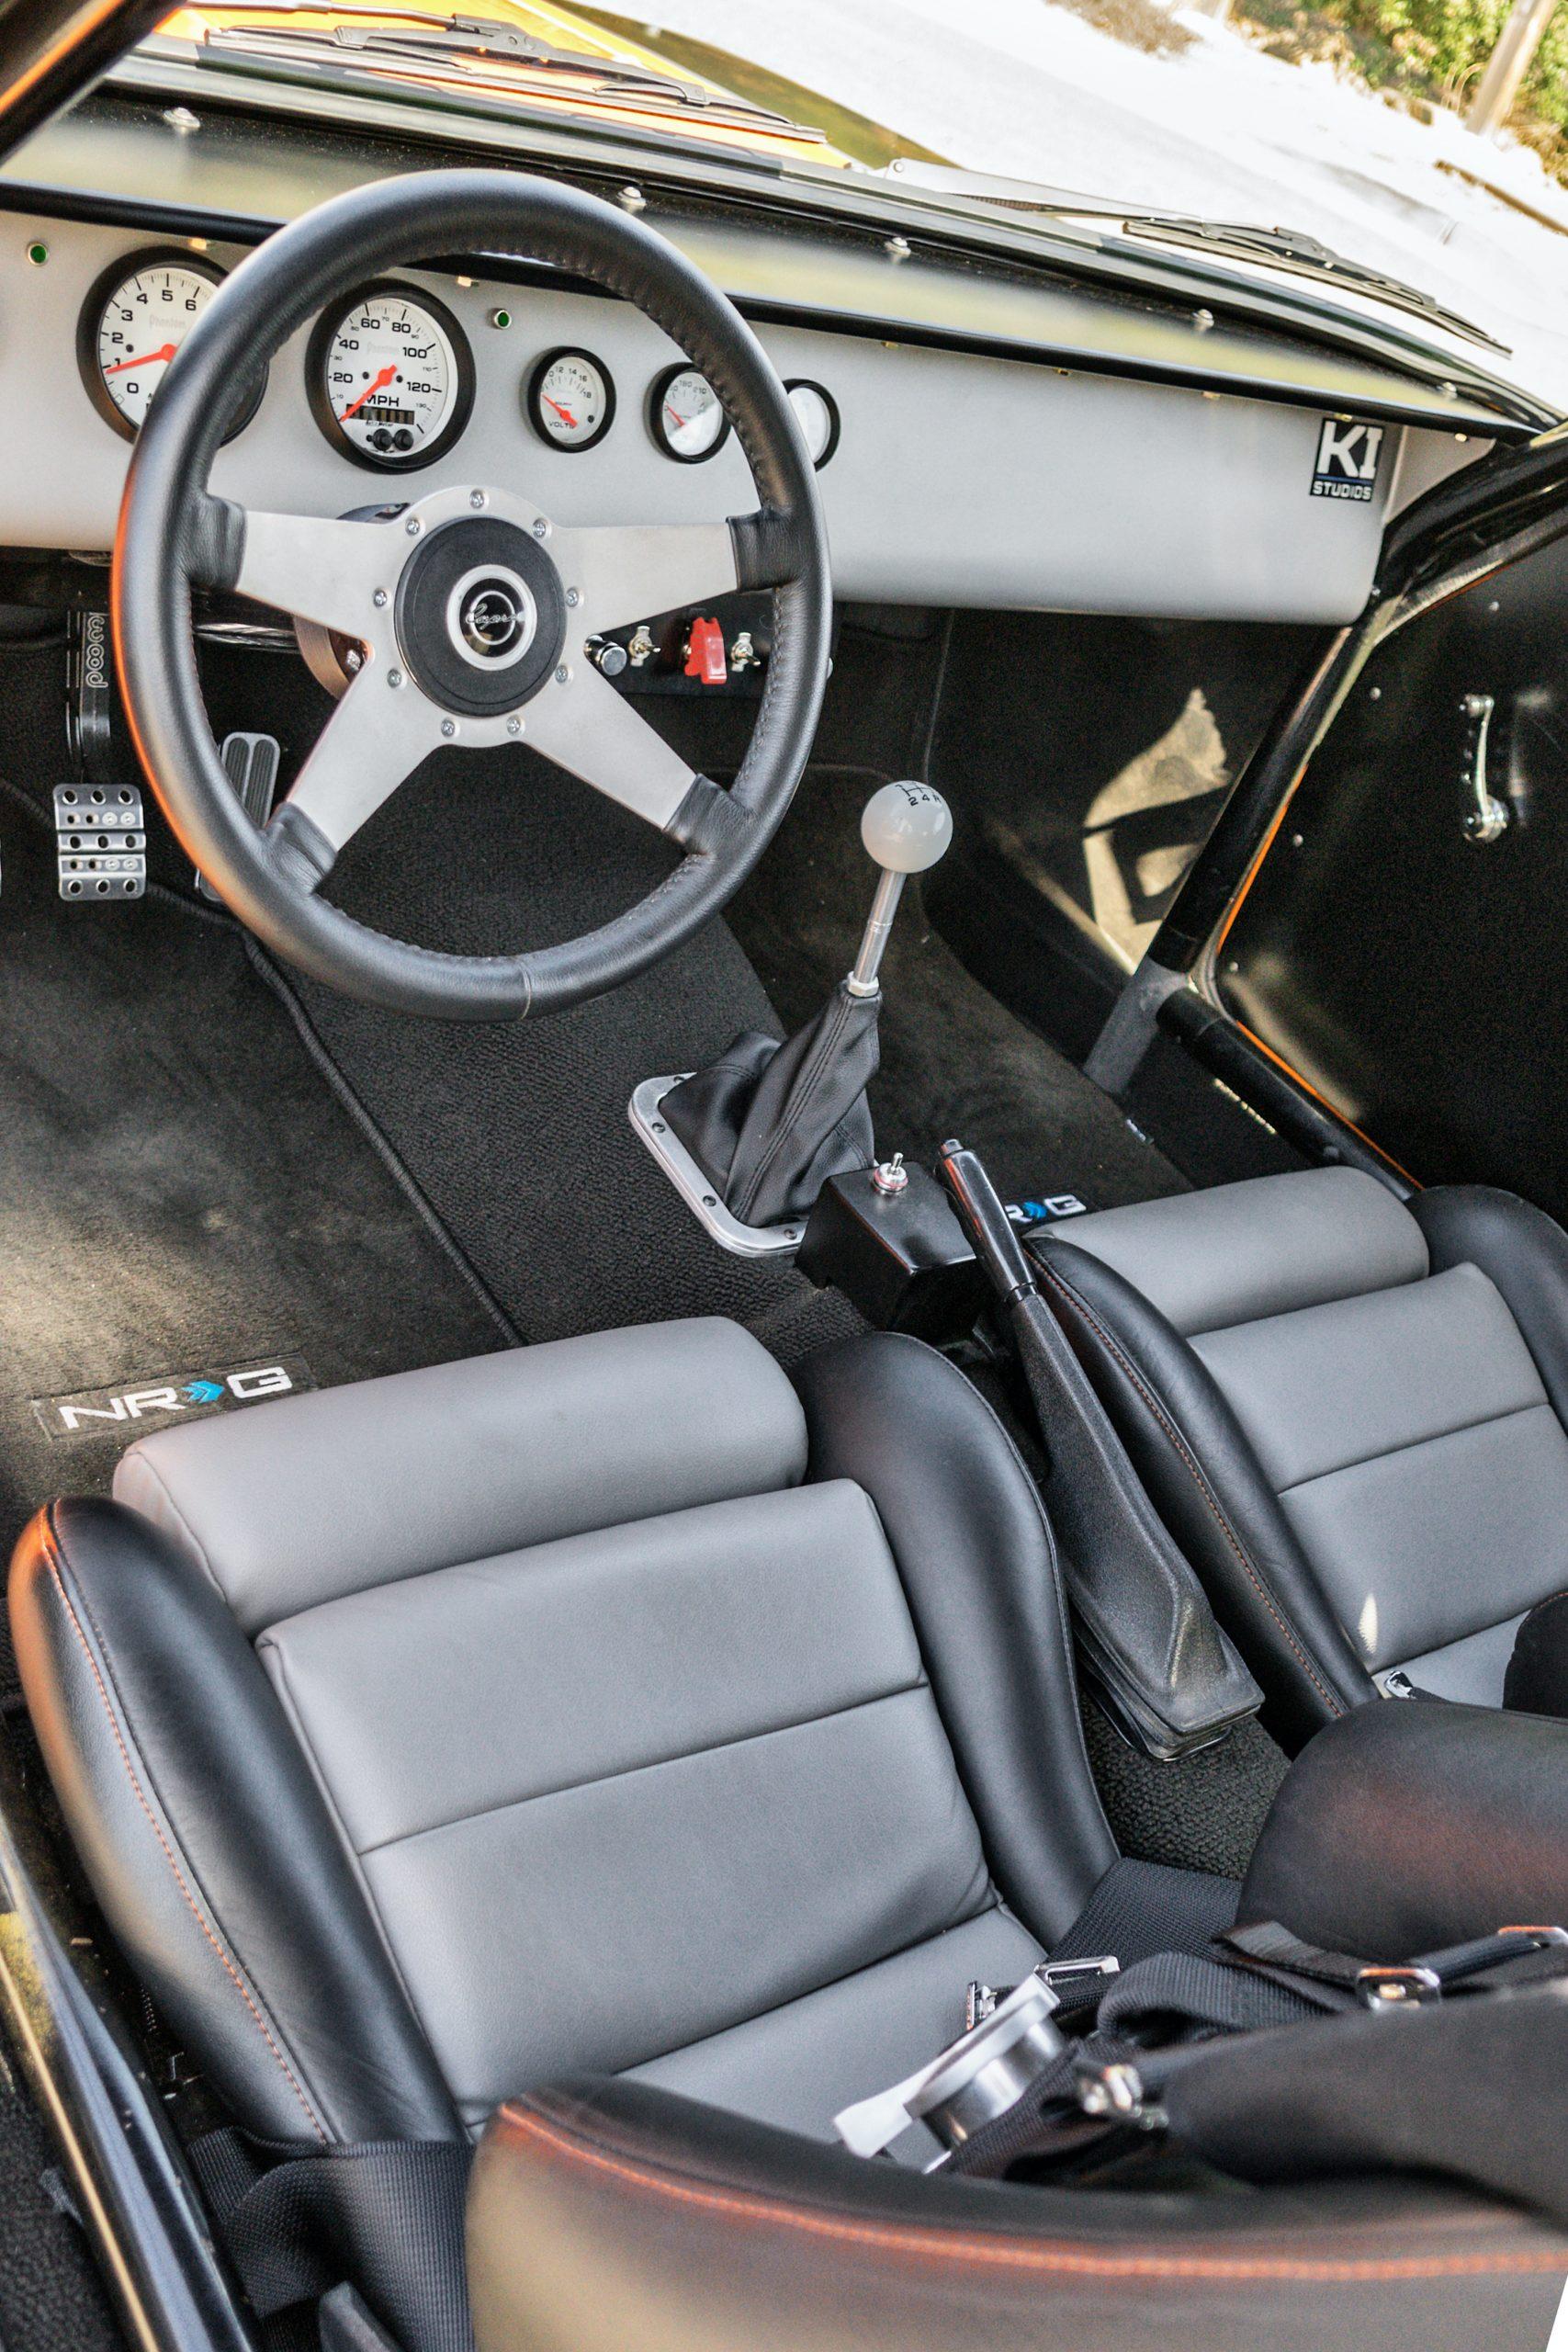 1974 Mk I Ford Capri restomod interior cockpit